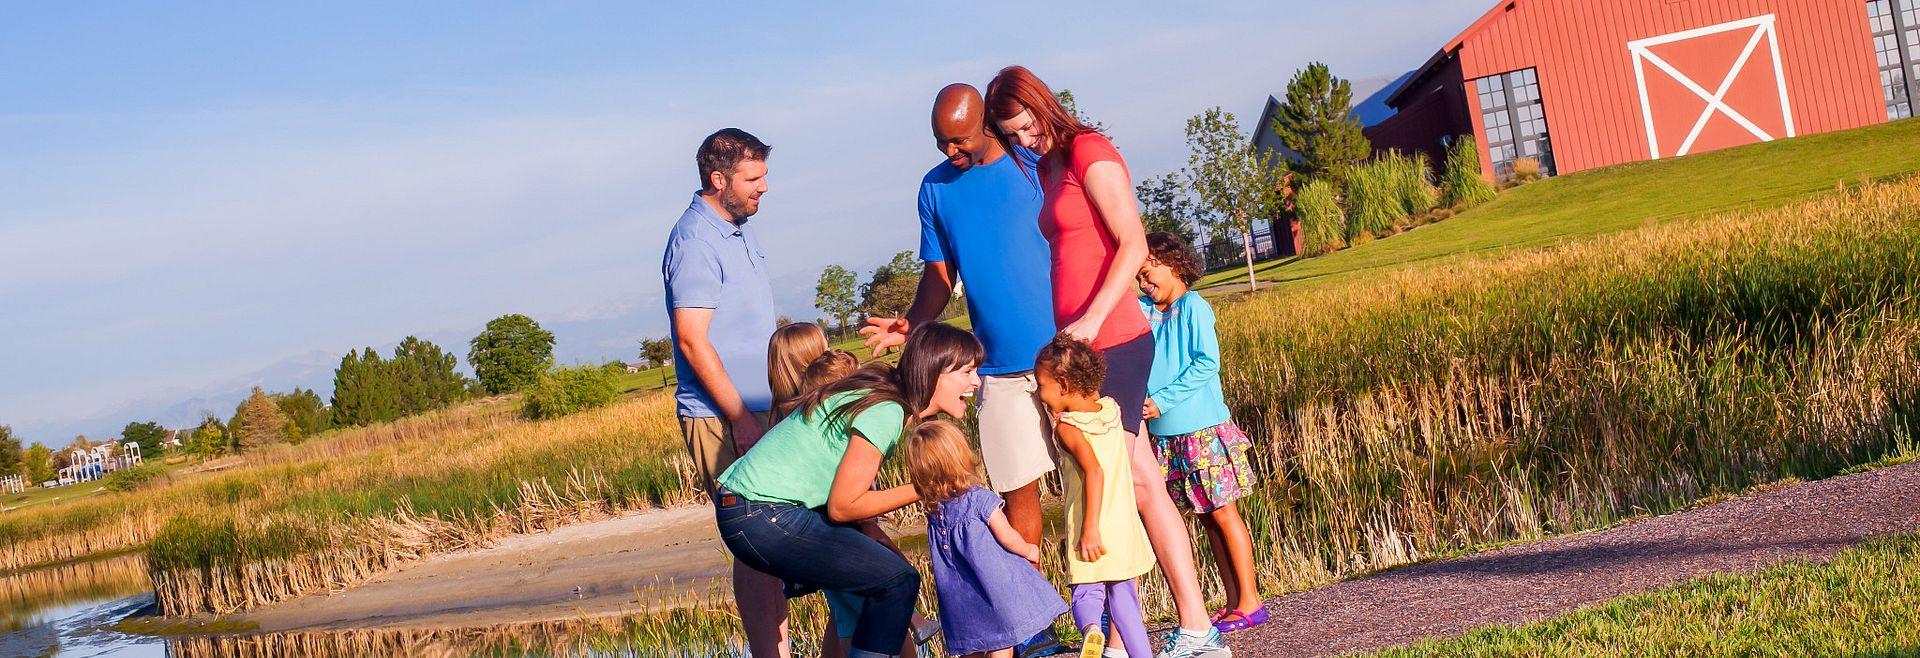 Reunion Community Friends Walking Trails